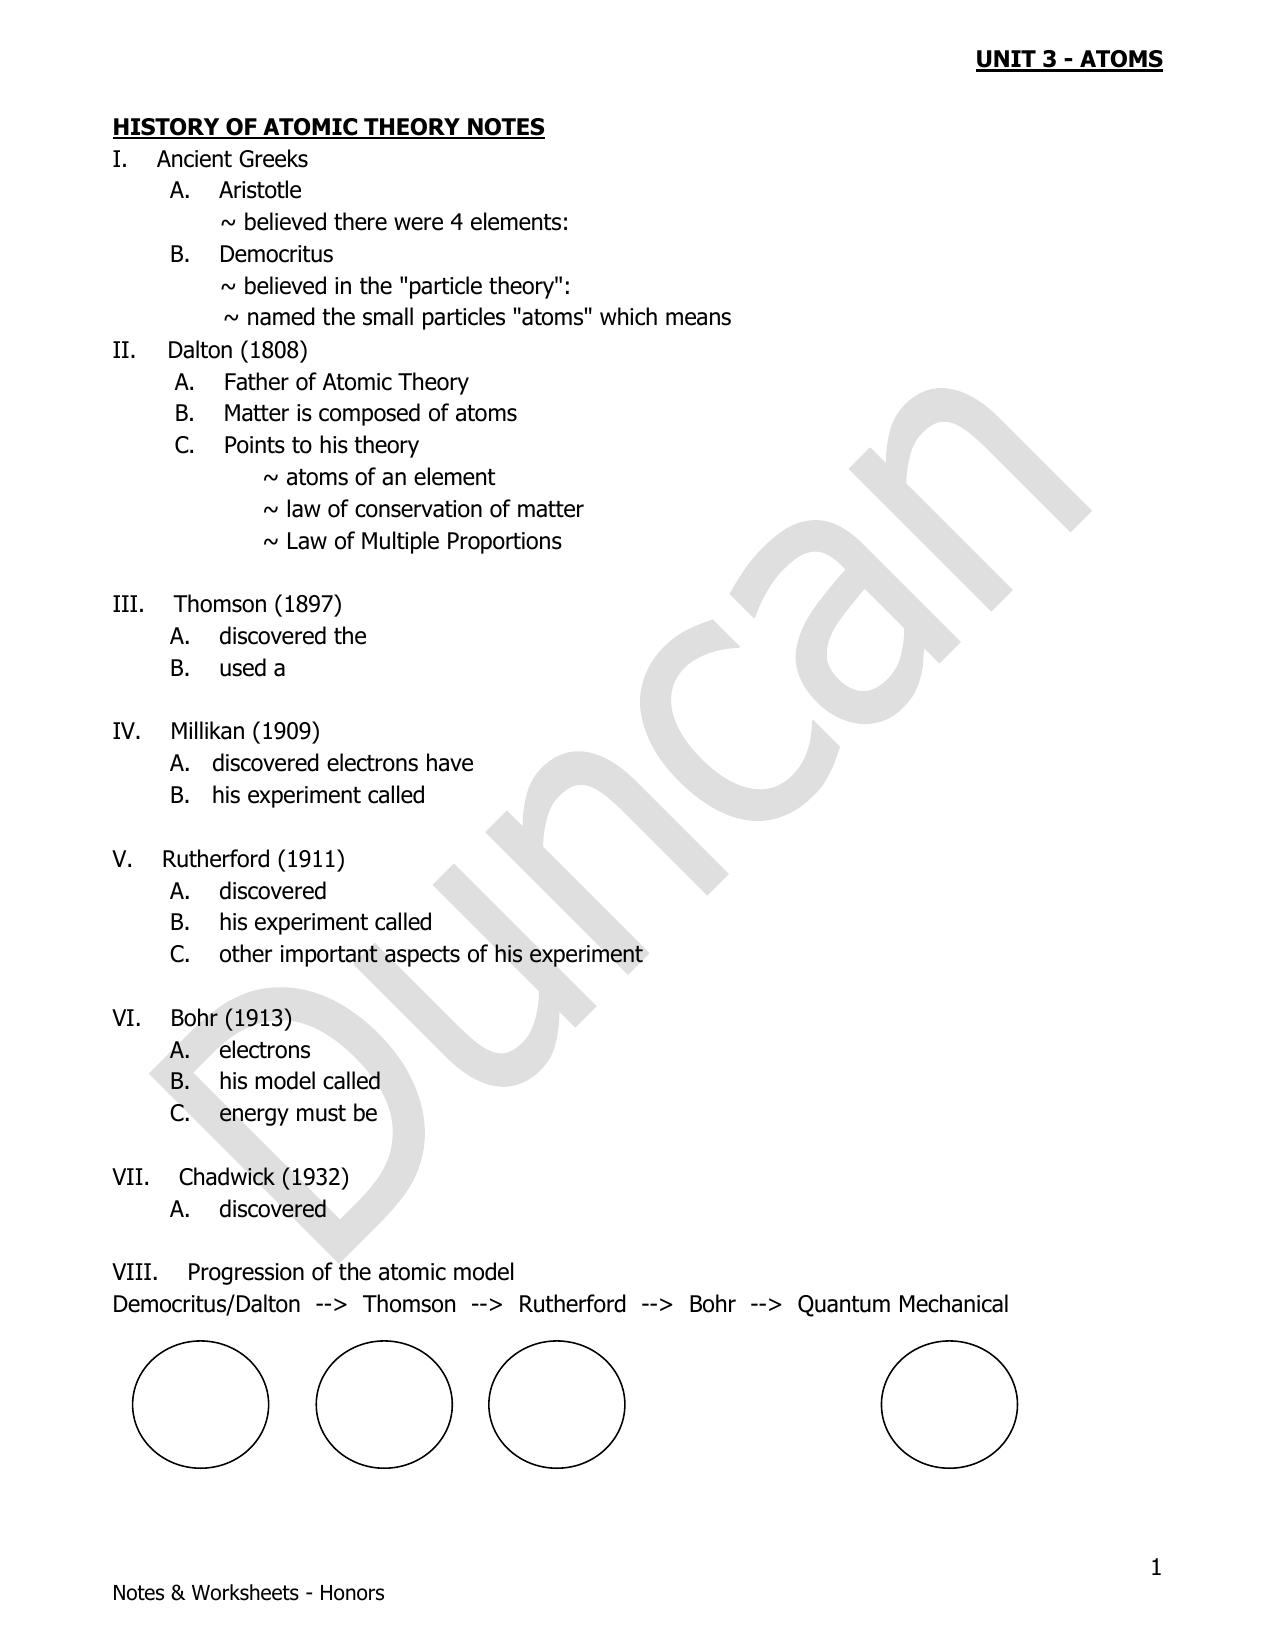 History Of Atomic Theory Worksheet